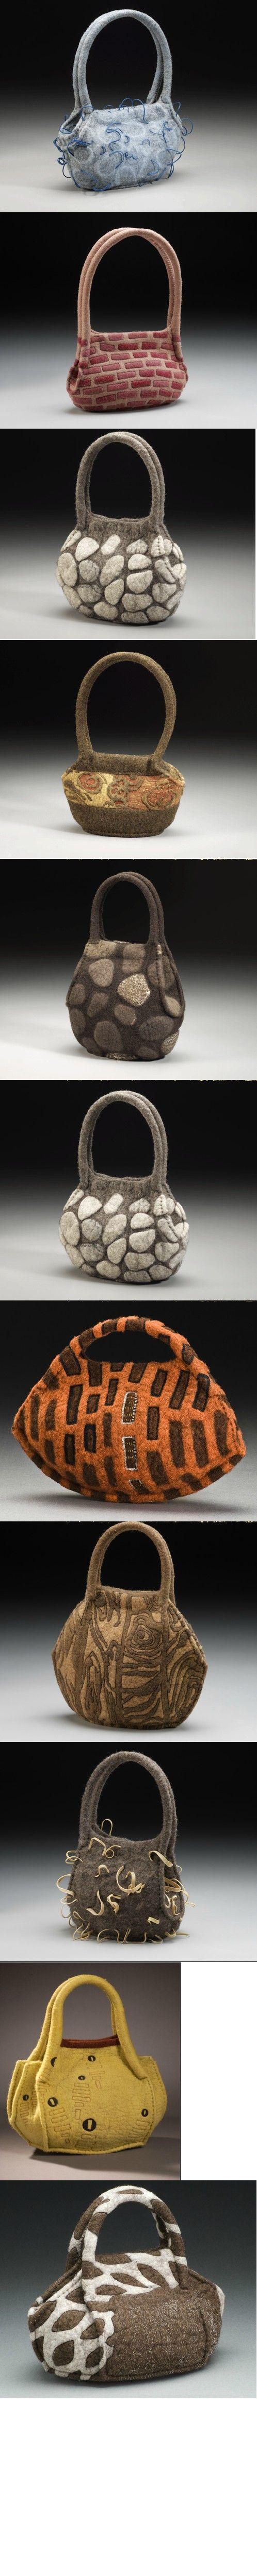 http://www.strongfelt.com/  Lisa Klakulak's creativity-- she's fantastic!